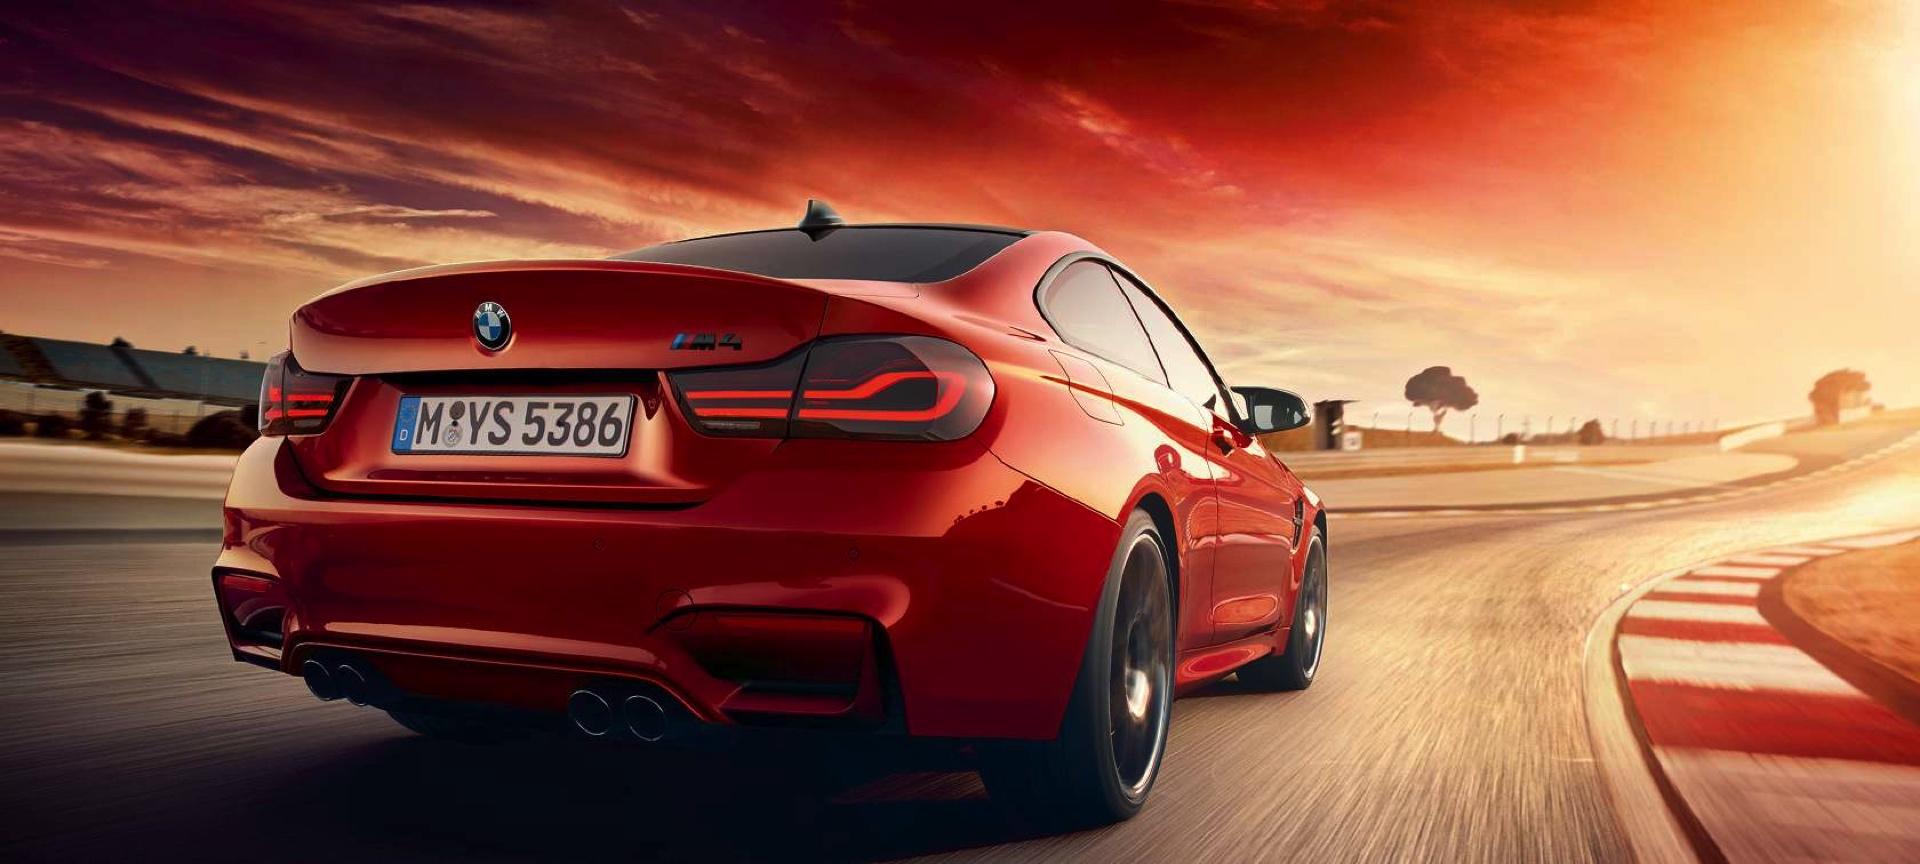 Name:  2019-BMW-M4-Facelift-Dark-Tail-Lights-2.jpg Views: 4378 Size:  384.7 KB